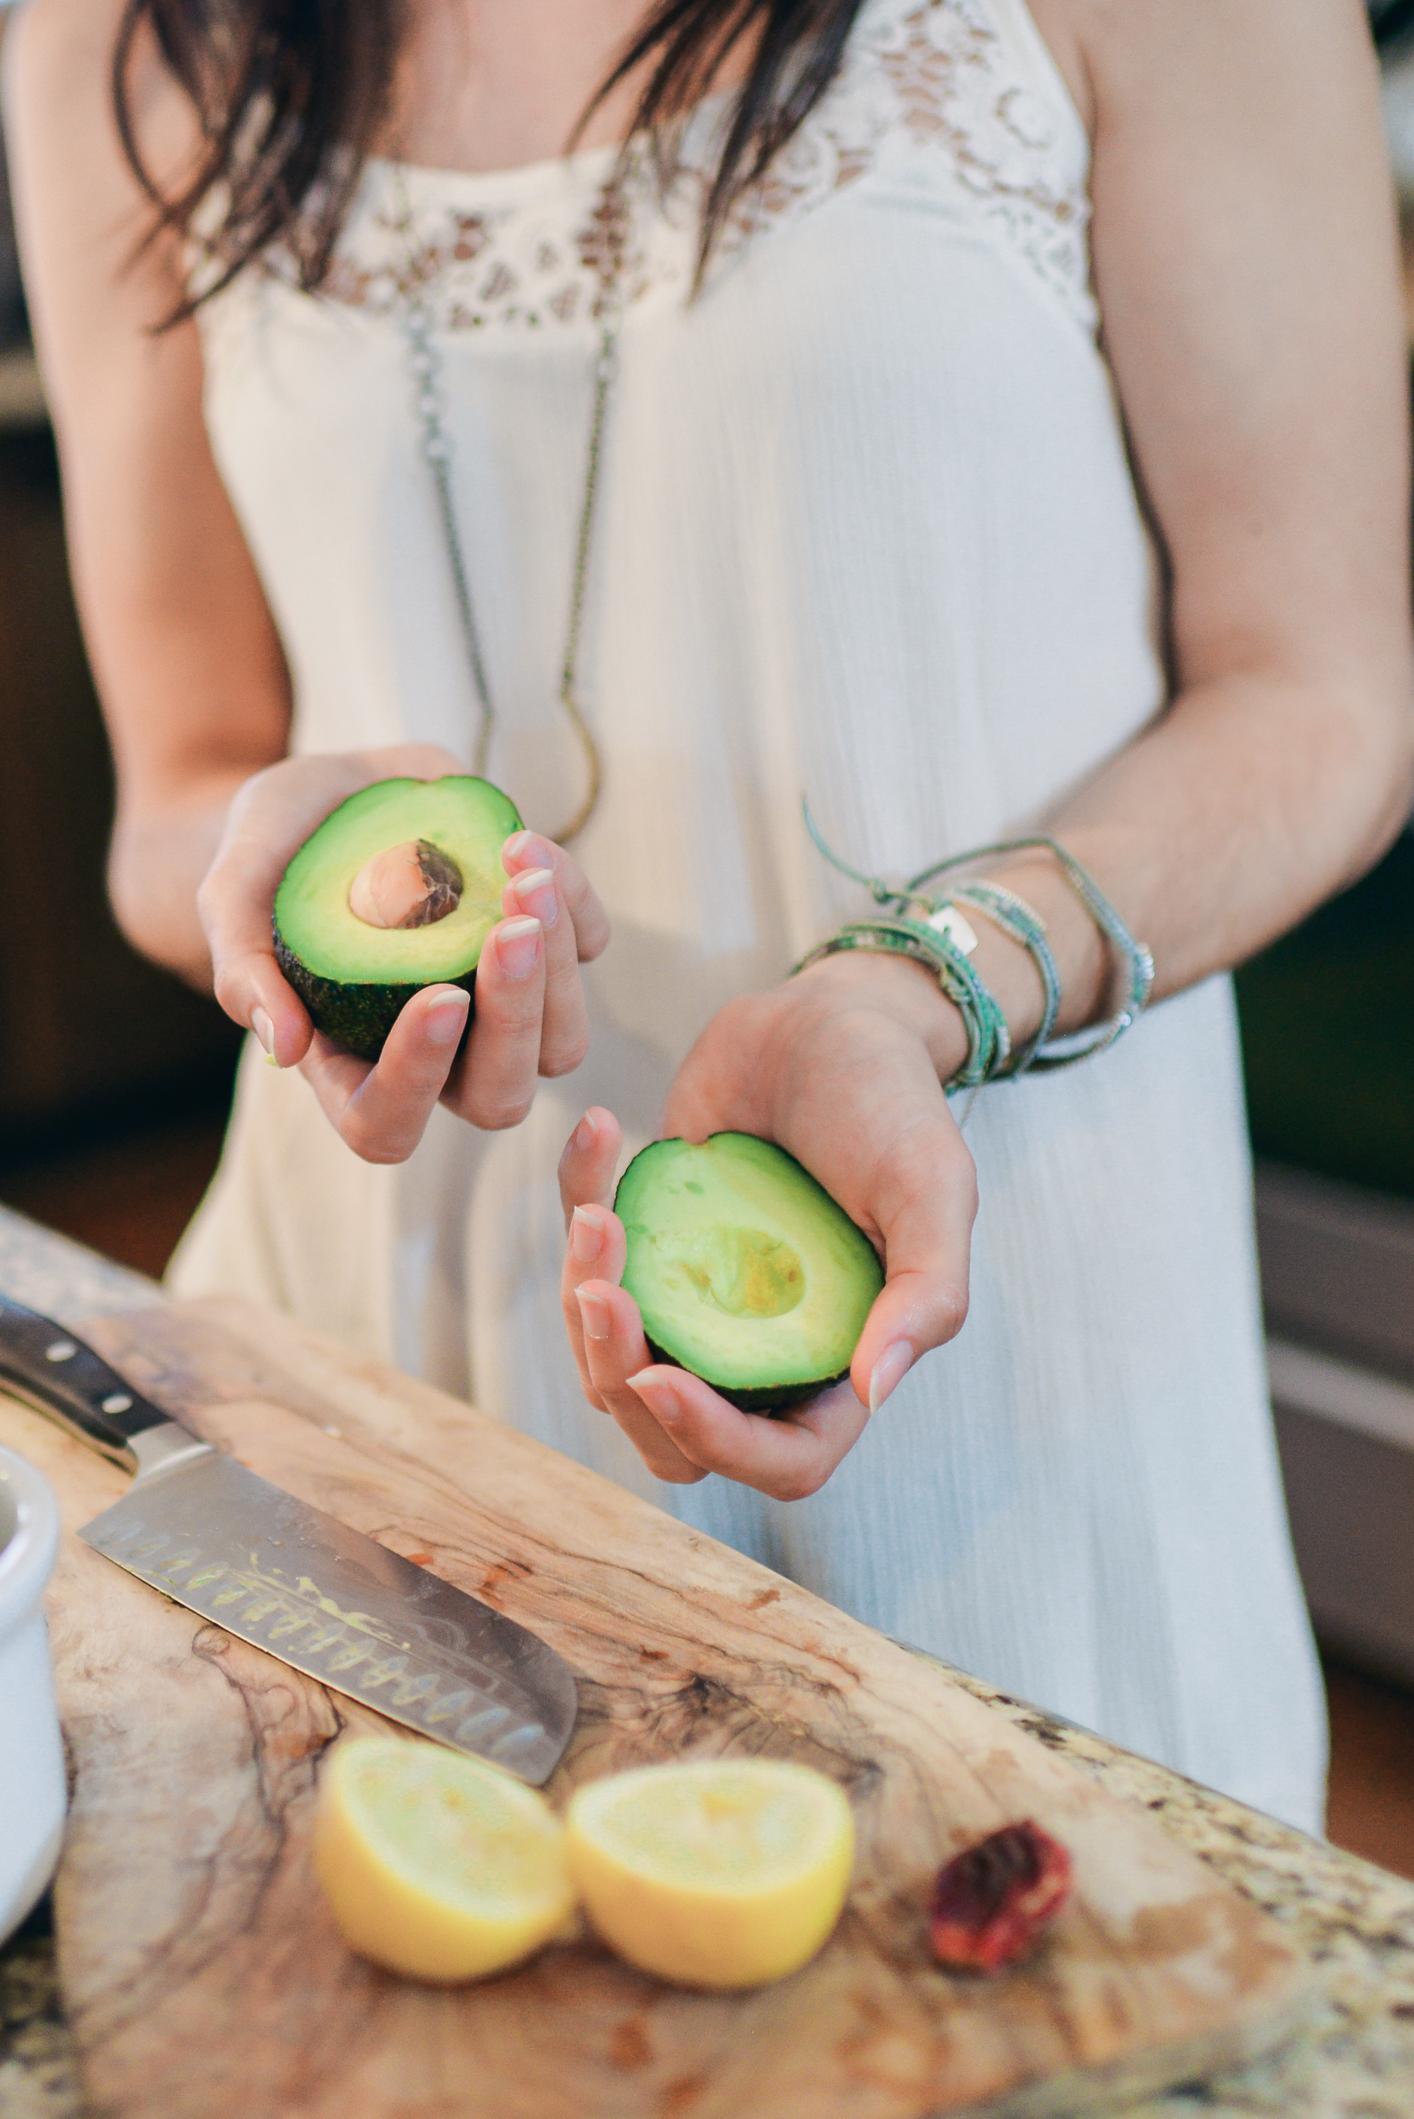 Avocado A Day Nutrition